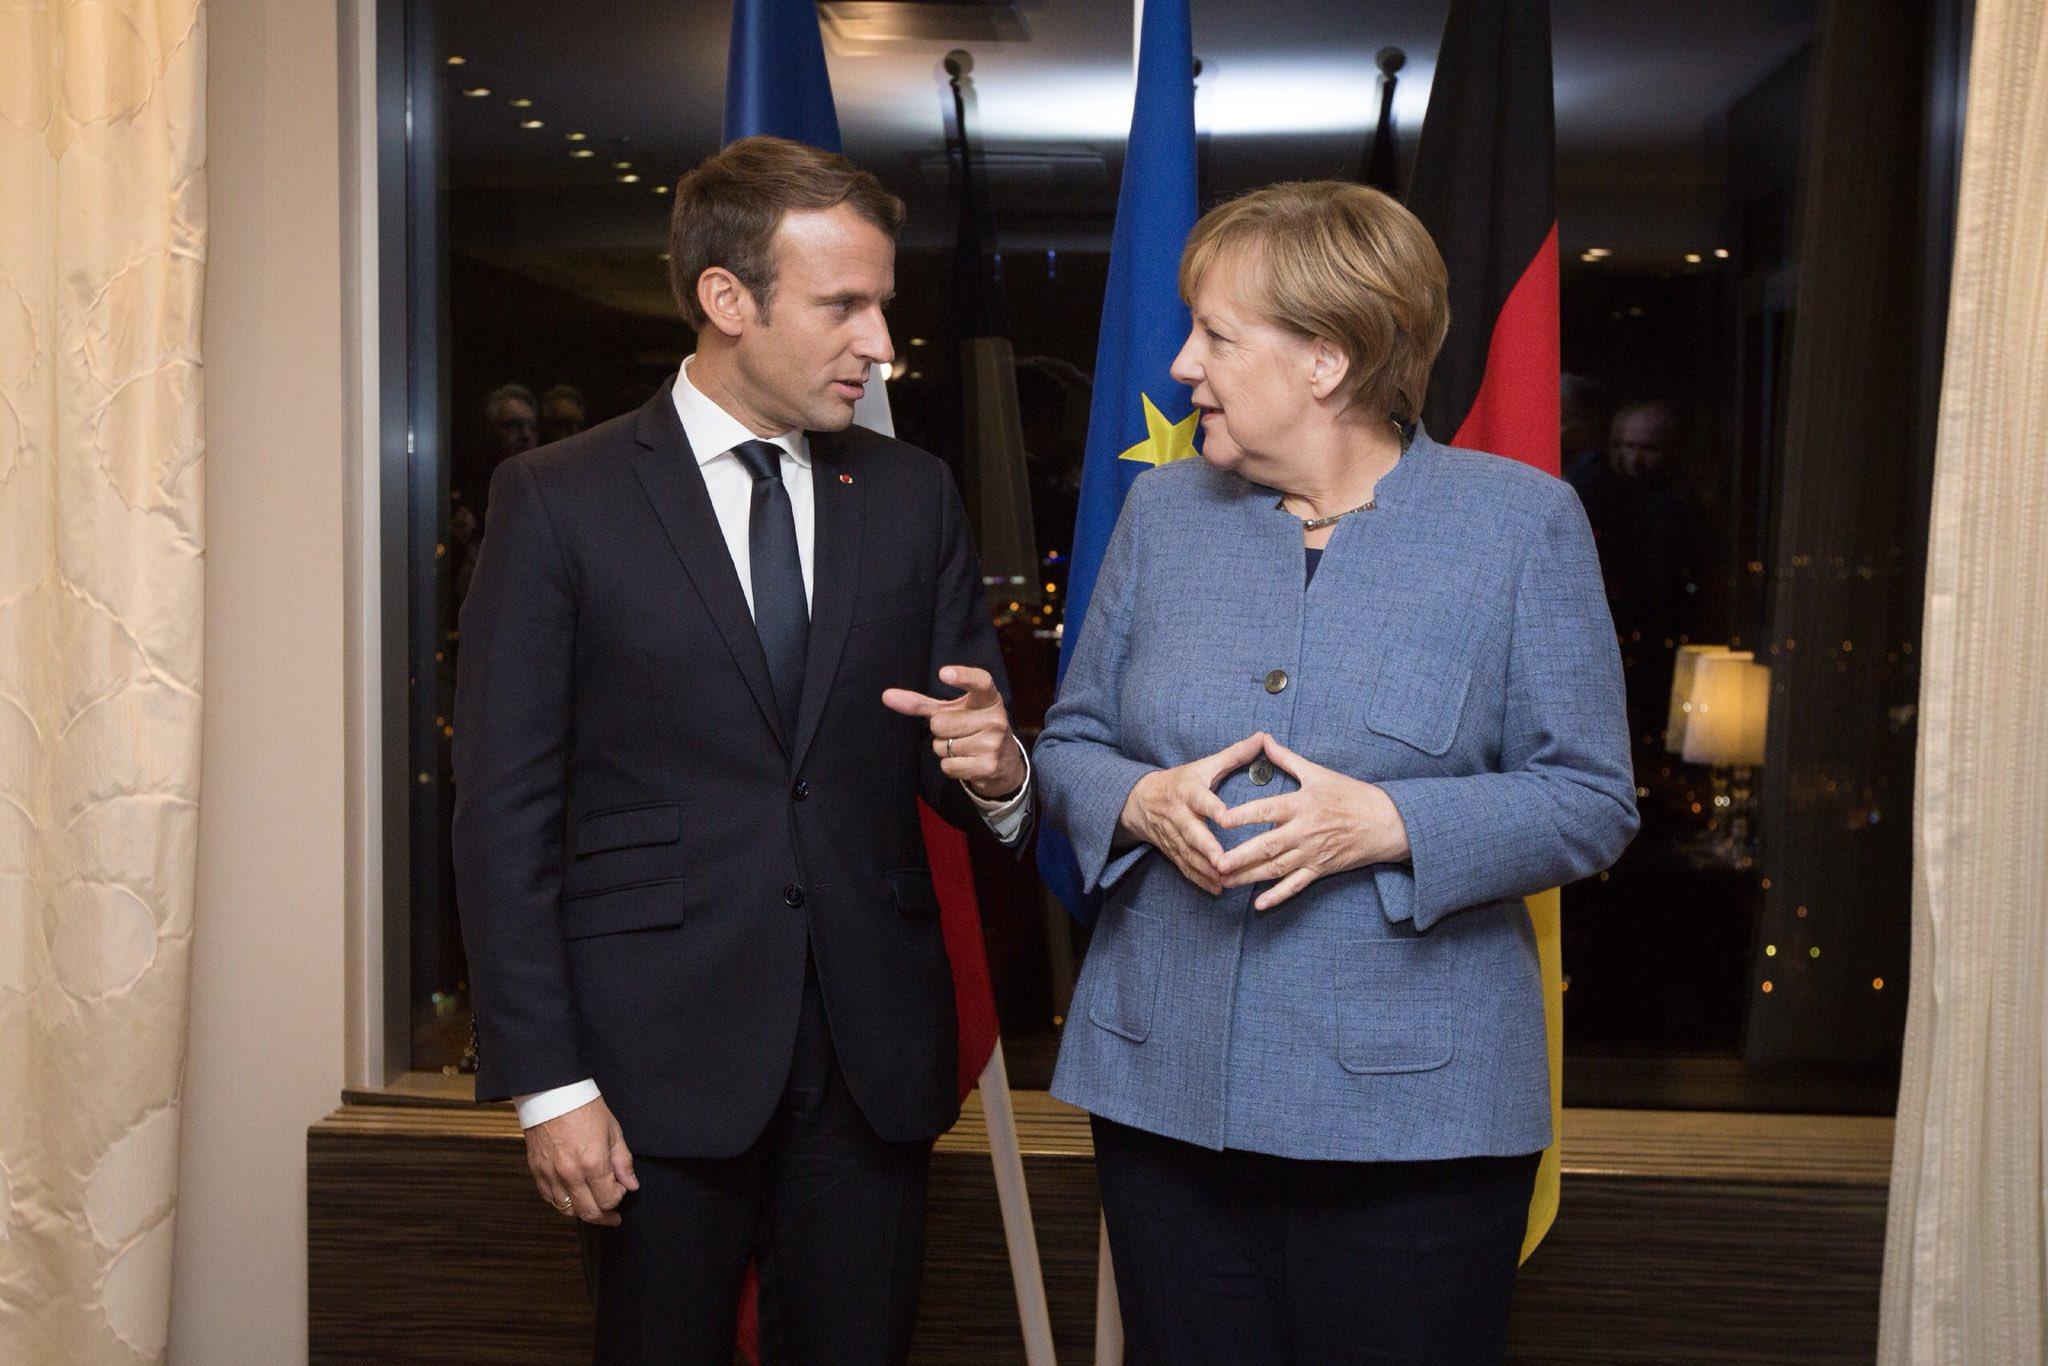 Discussion avec Angela Merkel pour faire avancer l'Europe avant le #TallinnDigitalSummit. https://t.co/qBtrW3u0BU